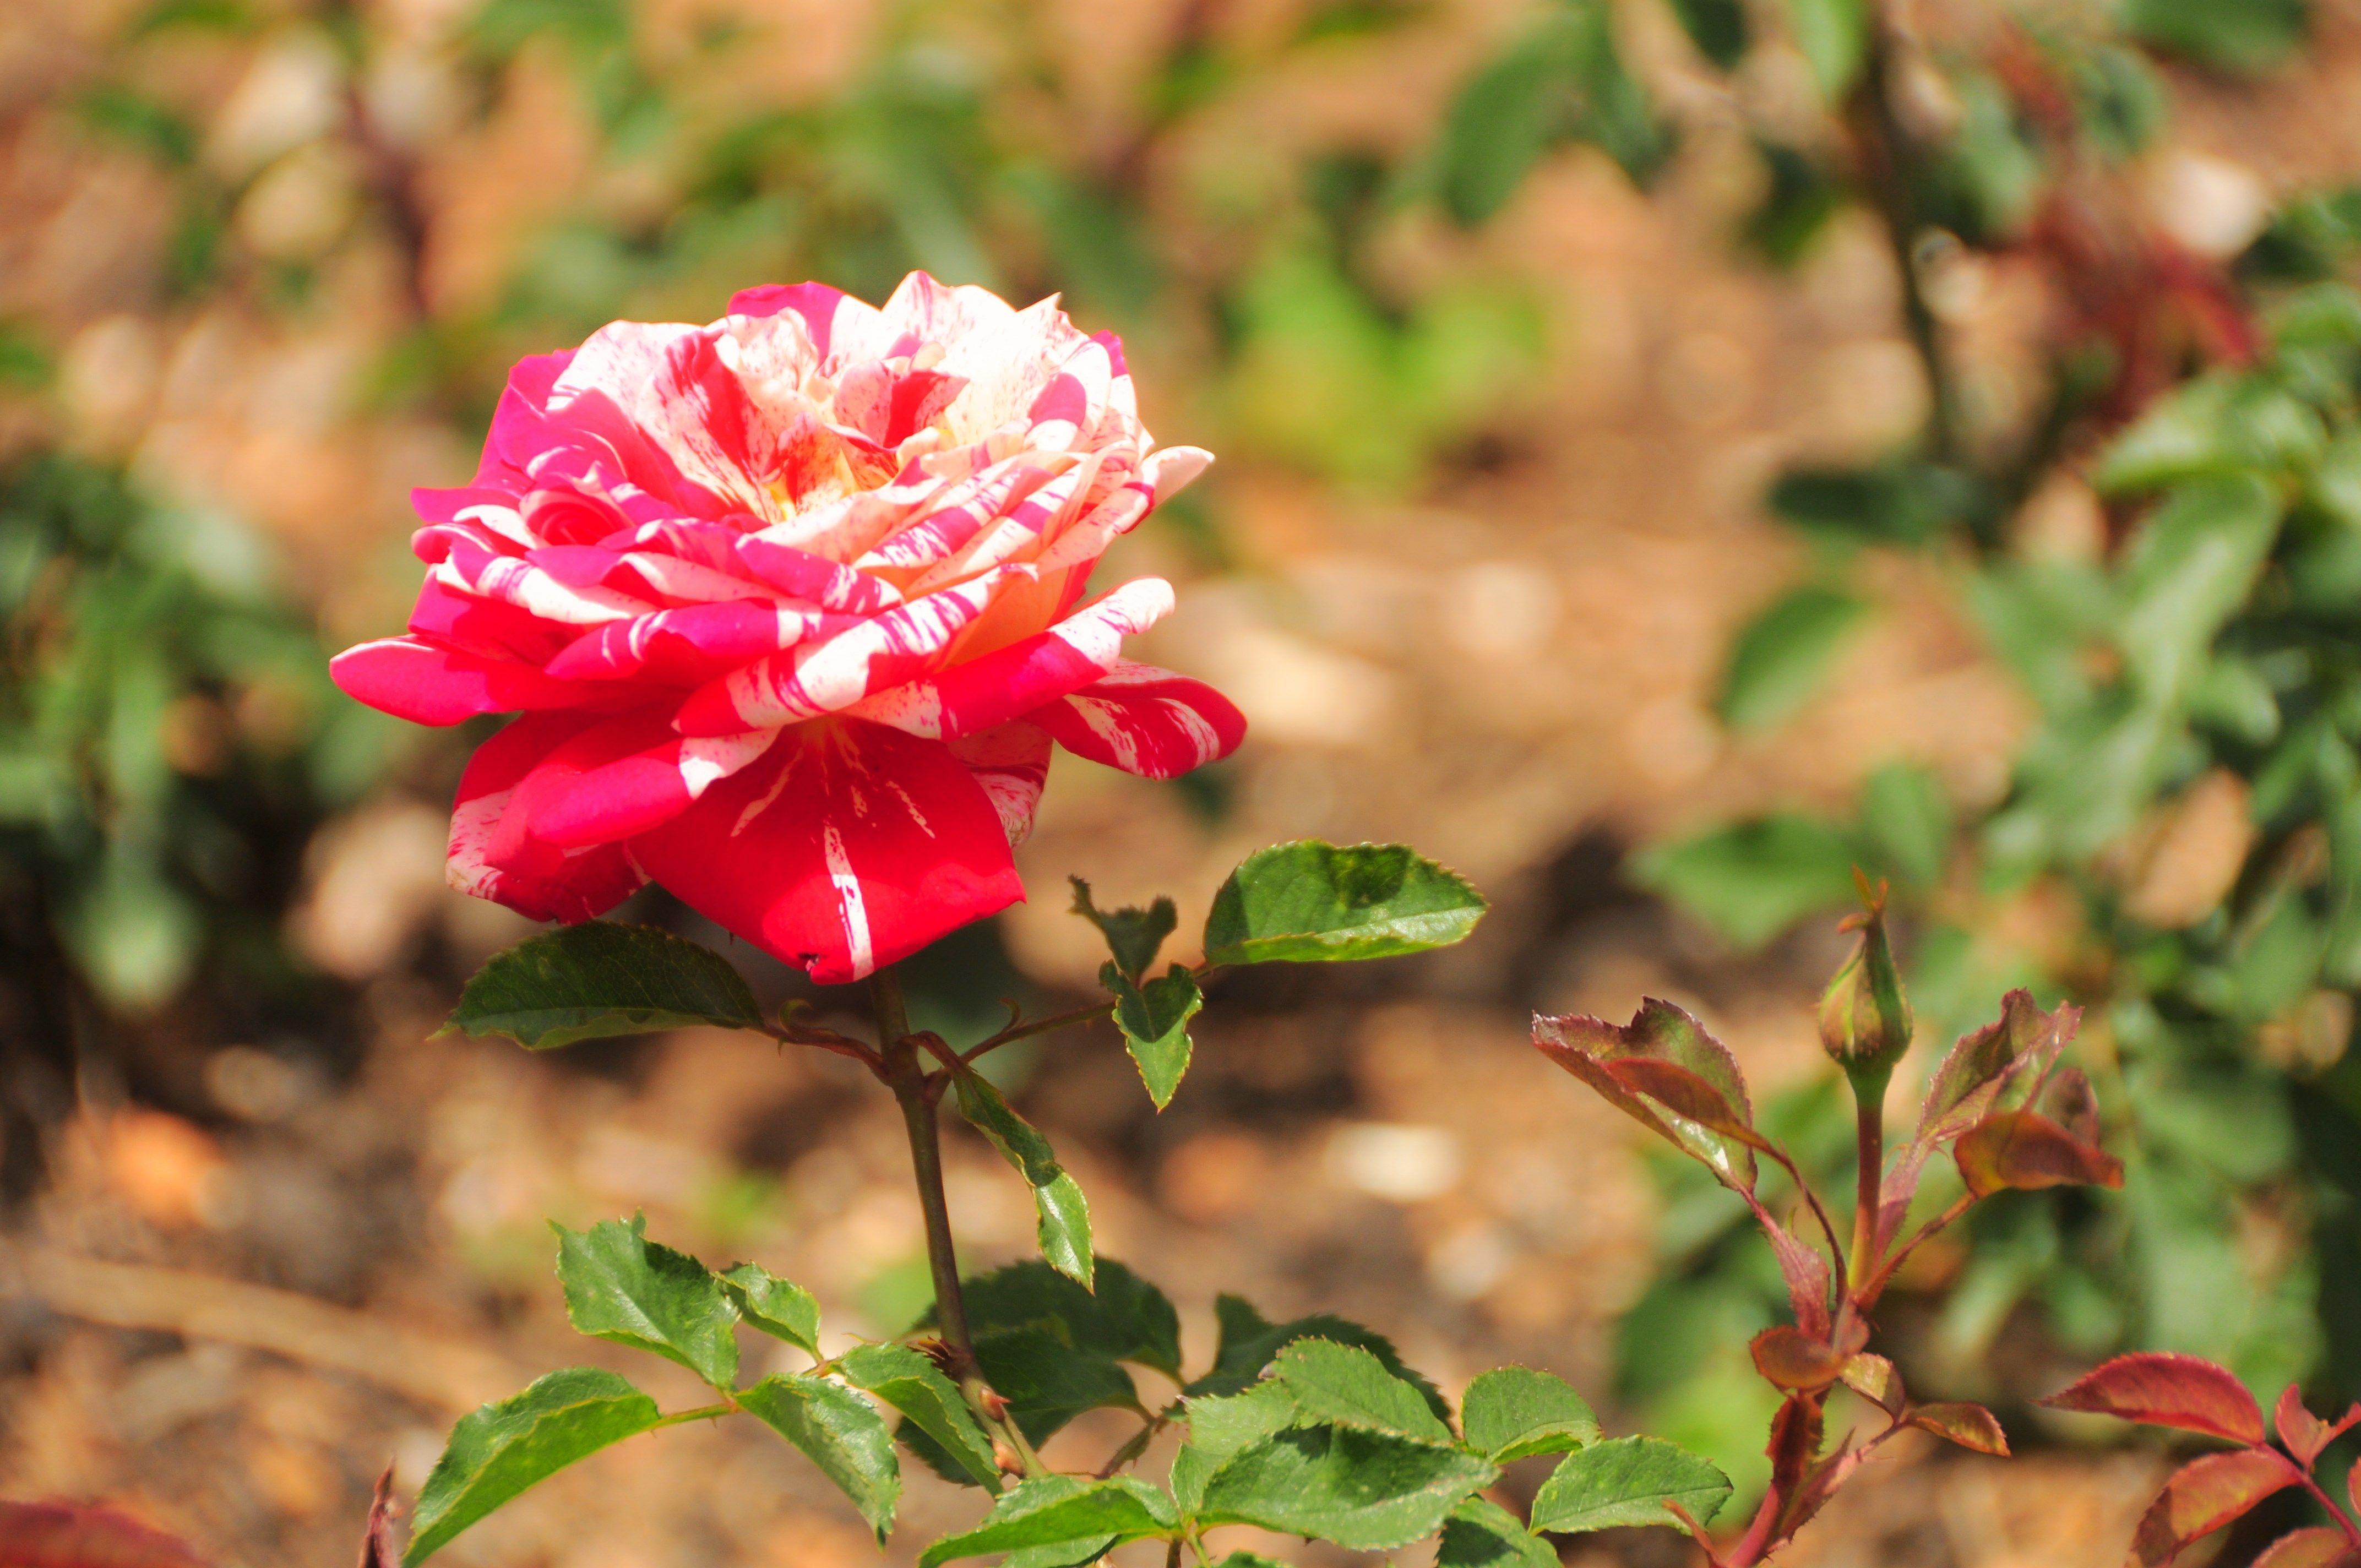 rose 4k wallpaper (4288x2848) Выращивание роз и Розы